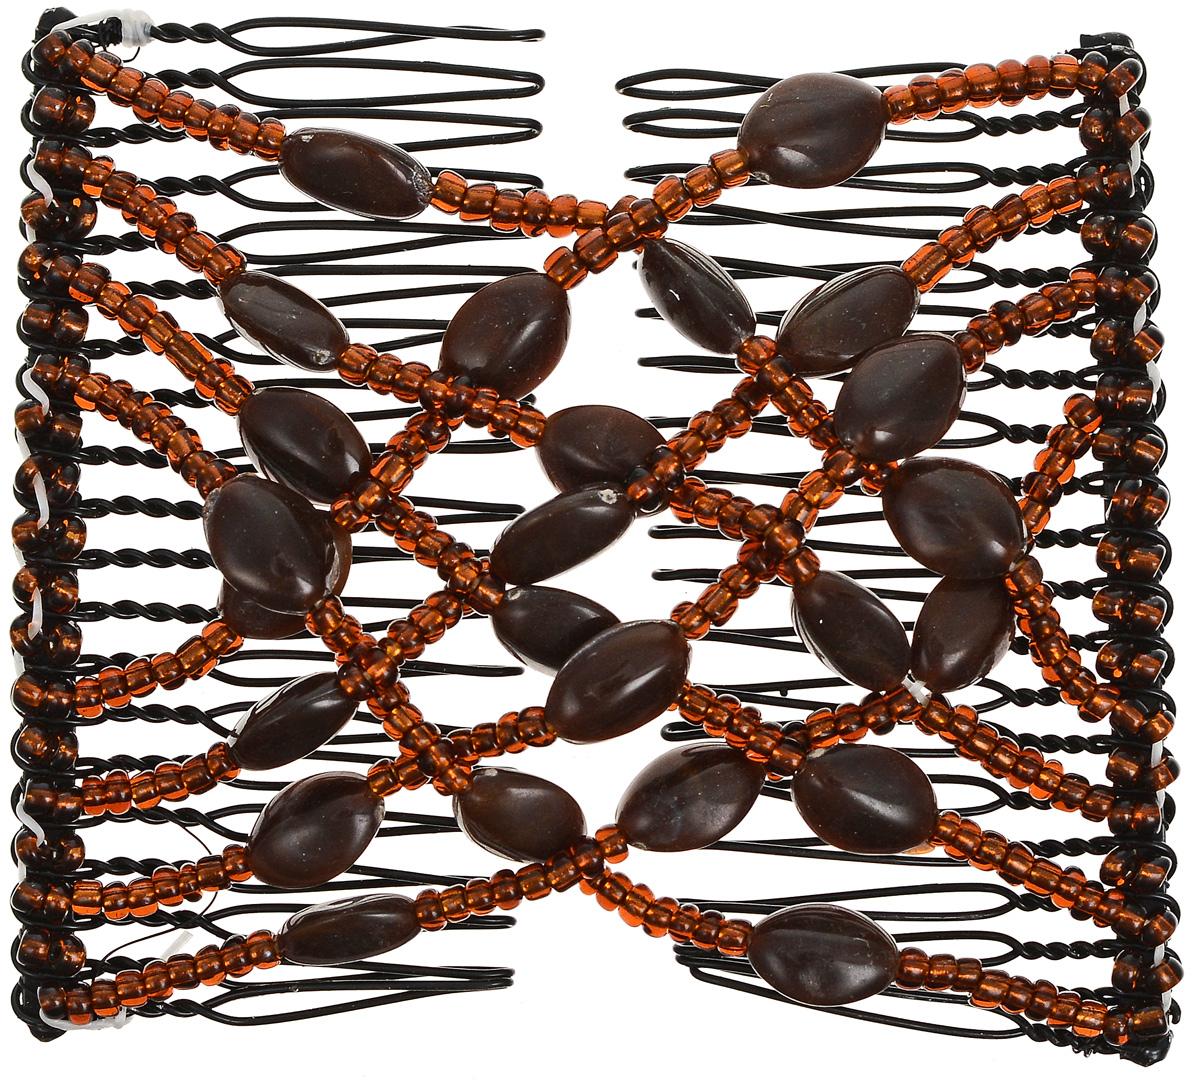 EZ-Combs Заколка Изи-Комбс, одинарная, цвет: коричневый. ЗИО_плоский овал hairagami заколка хеагами одинарная коричневая